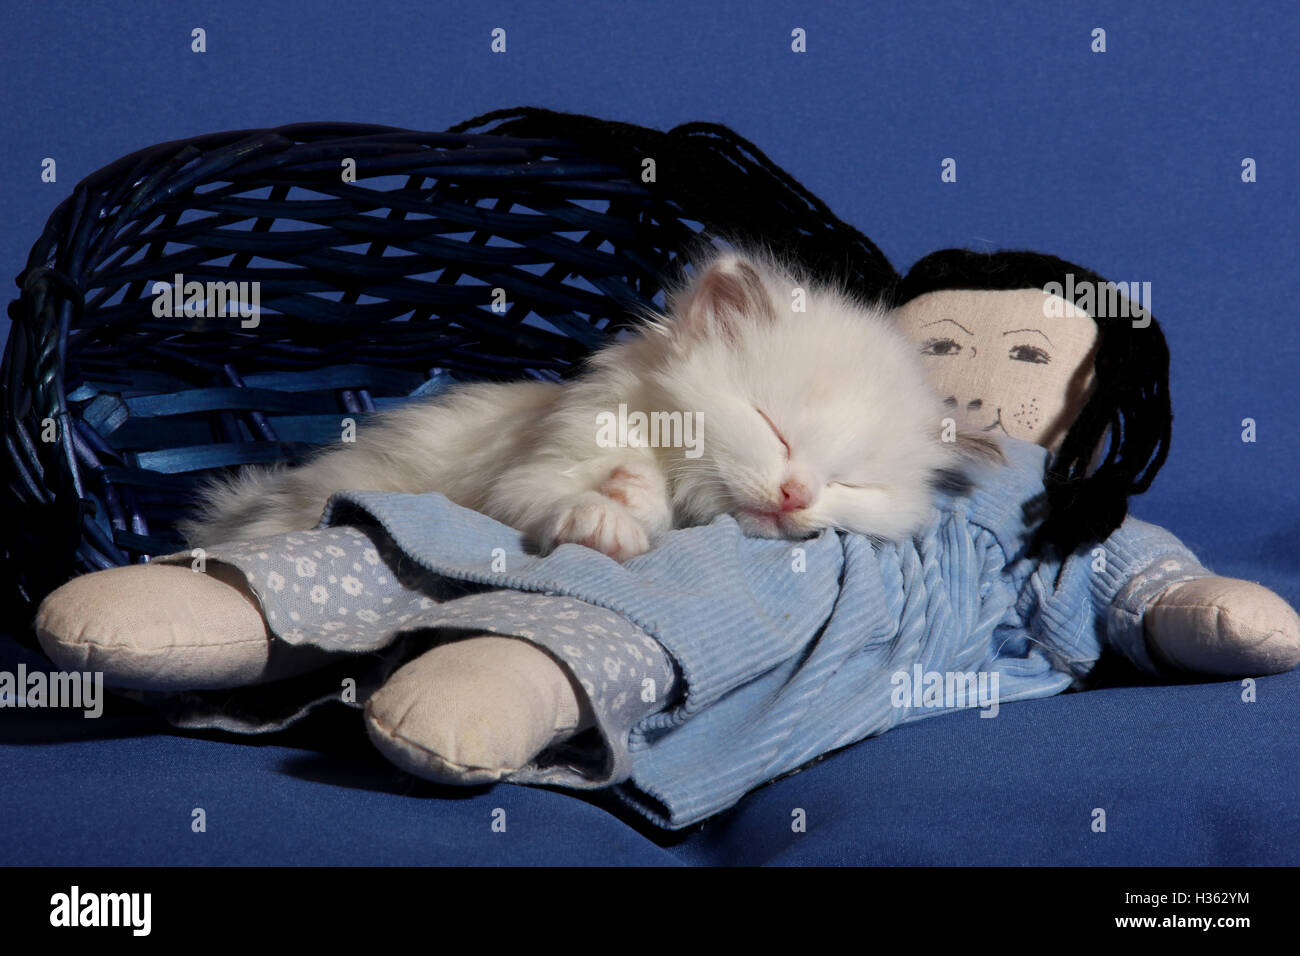 ragdoll kitten, 5 weeks old, sleeping on a doll, cat naps - Stock Image